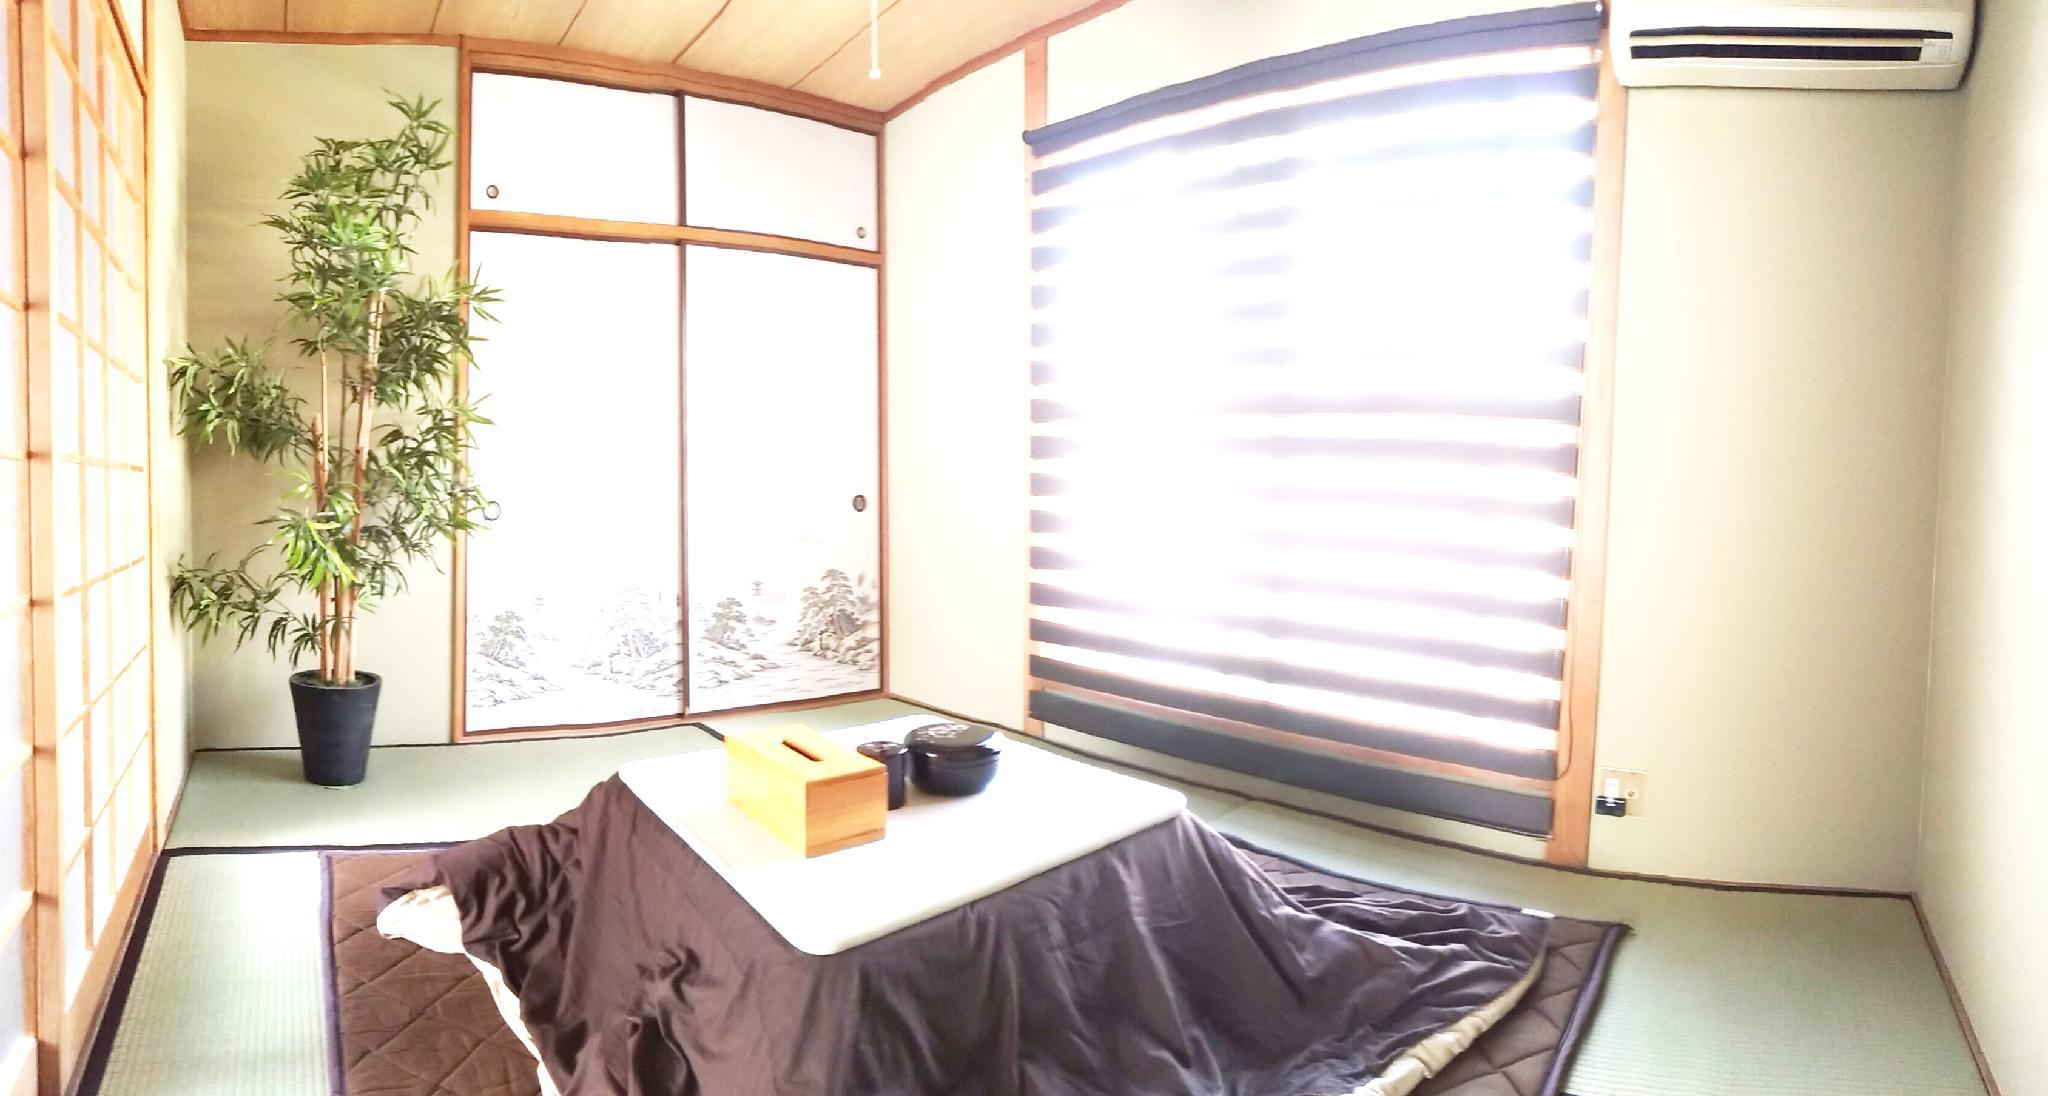 Fukuoka Near Tenjin Tatami Don Quijote Free Wi Fi